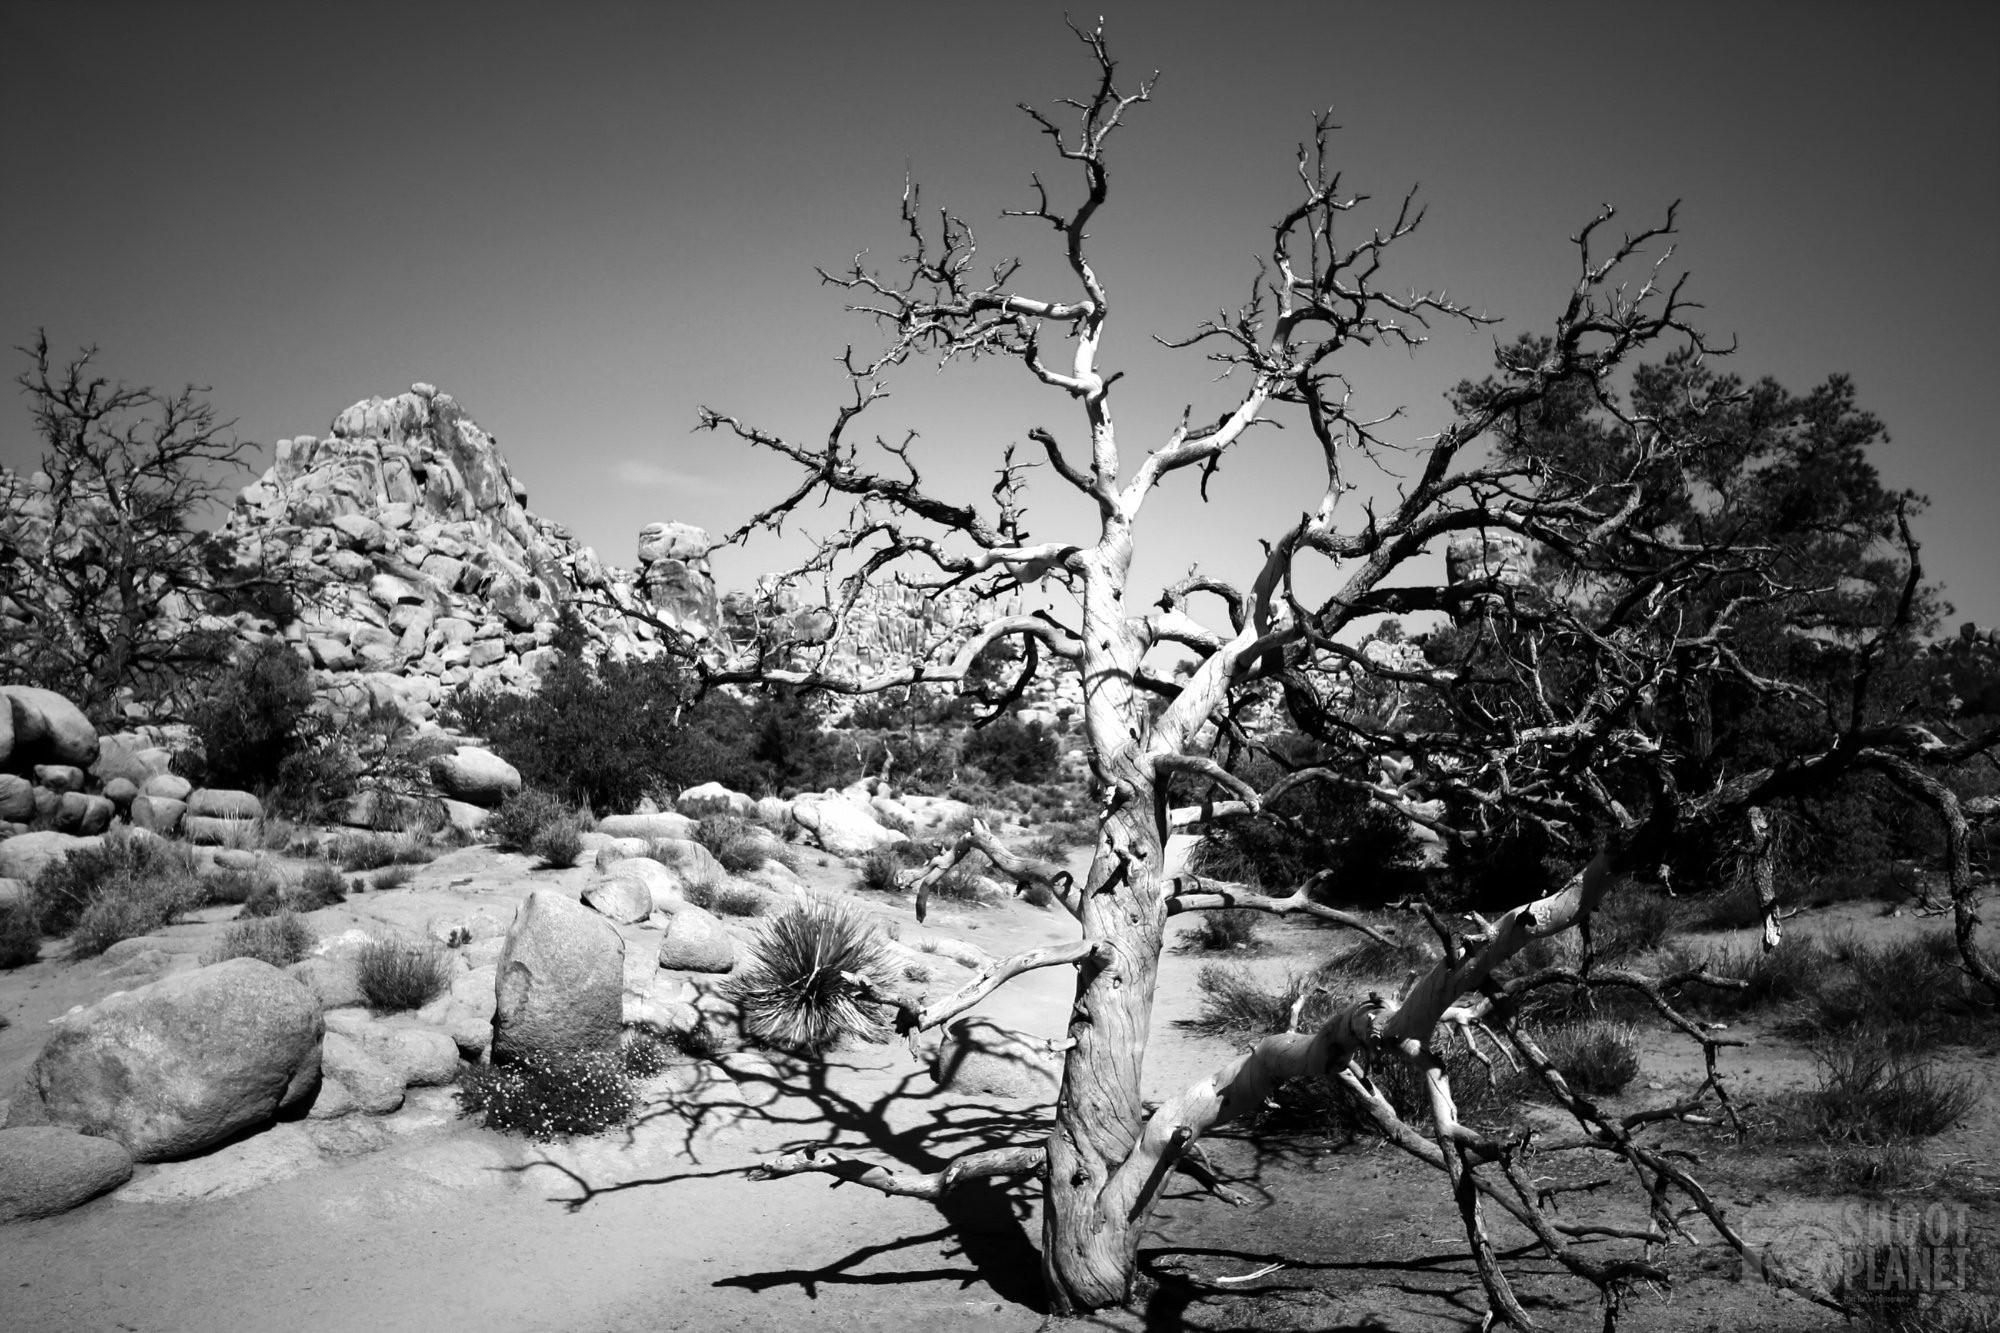 Warped dead tree, Joshua Tree Park, California